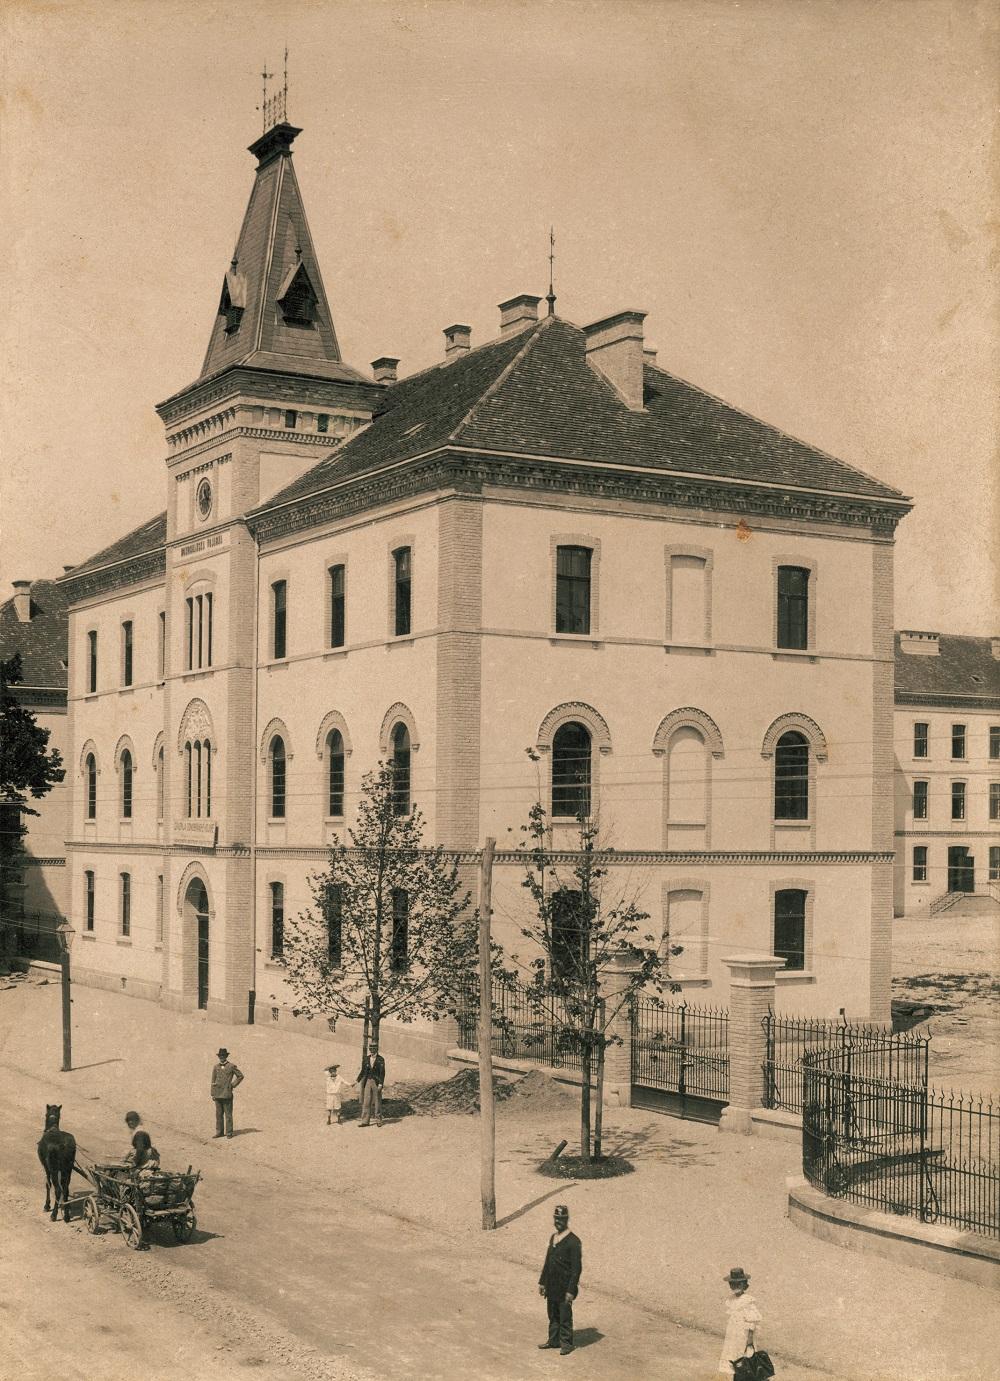 Glavna zgrada domobranske vojarne 'grofa Kulmera' (ilica 242), 1900.